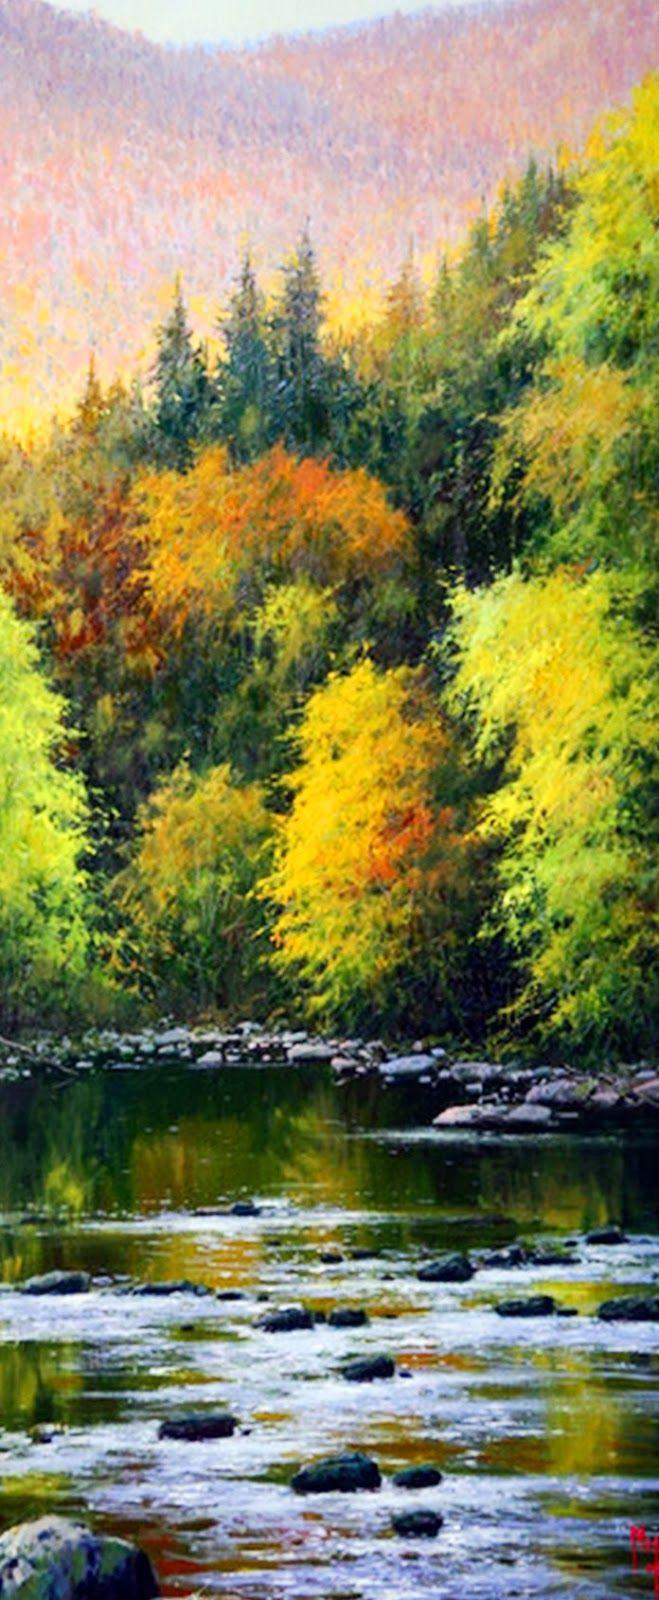 realismo-pinturas-de-paisajes-naturales